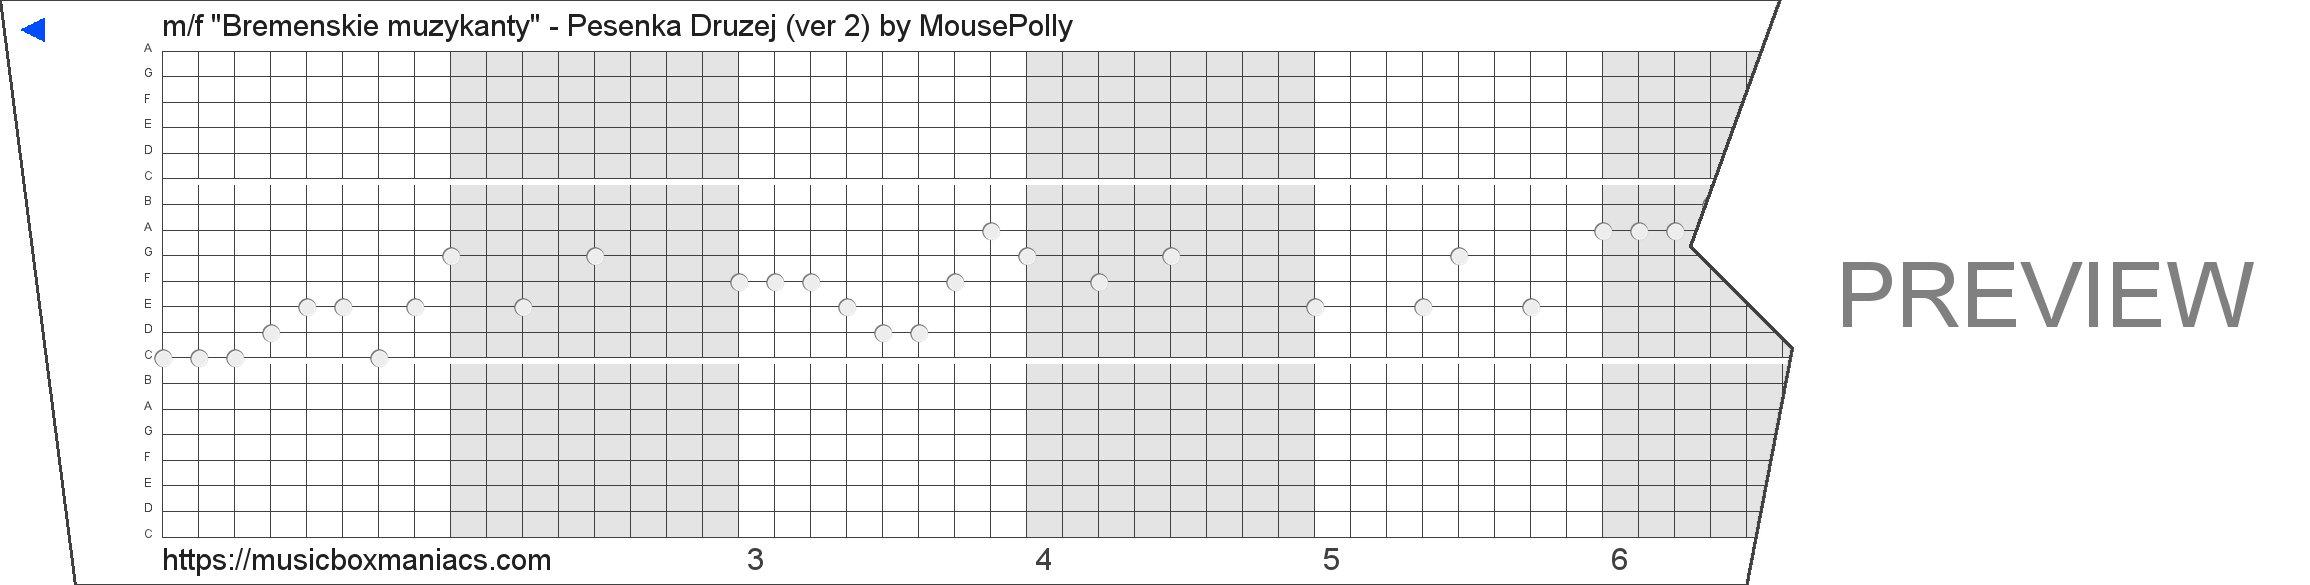 "m/f ""Bremenskie muzykanty"" - Pesenka Druzej (ver 2) 20 note music box paper strip"